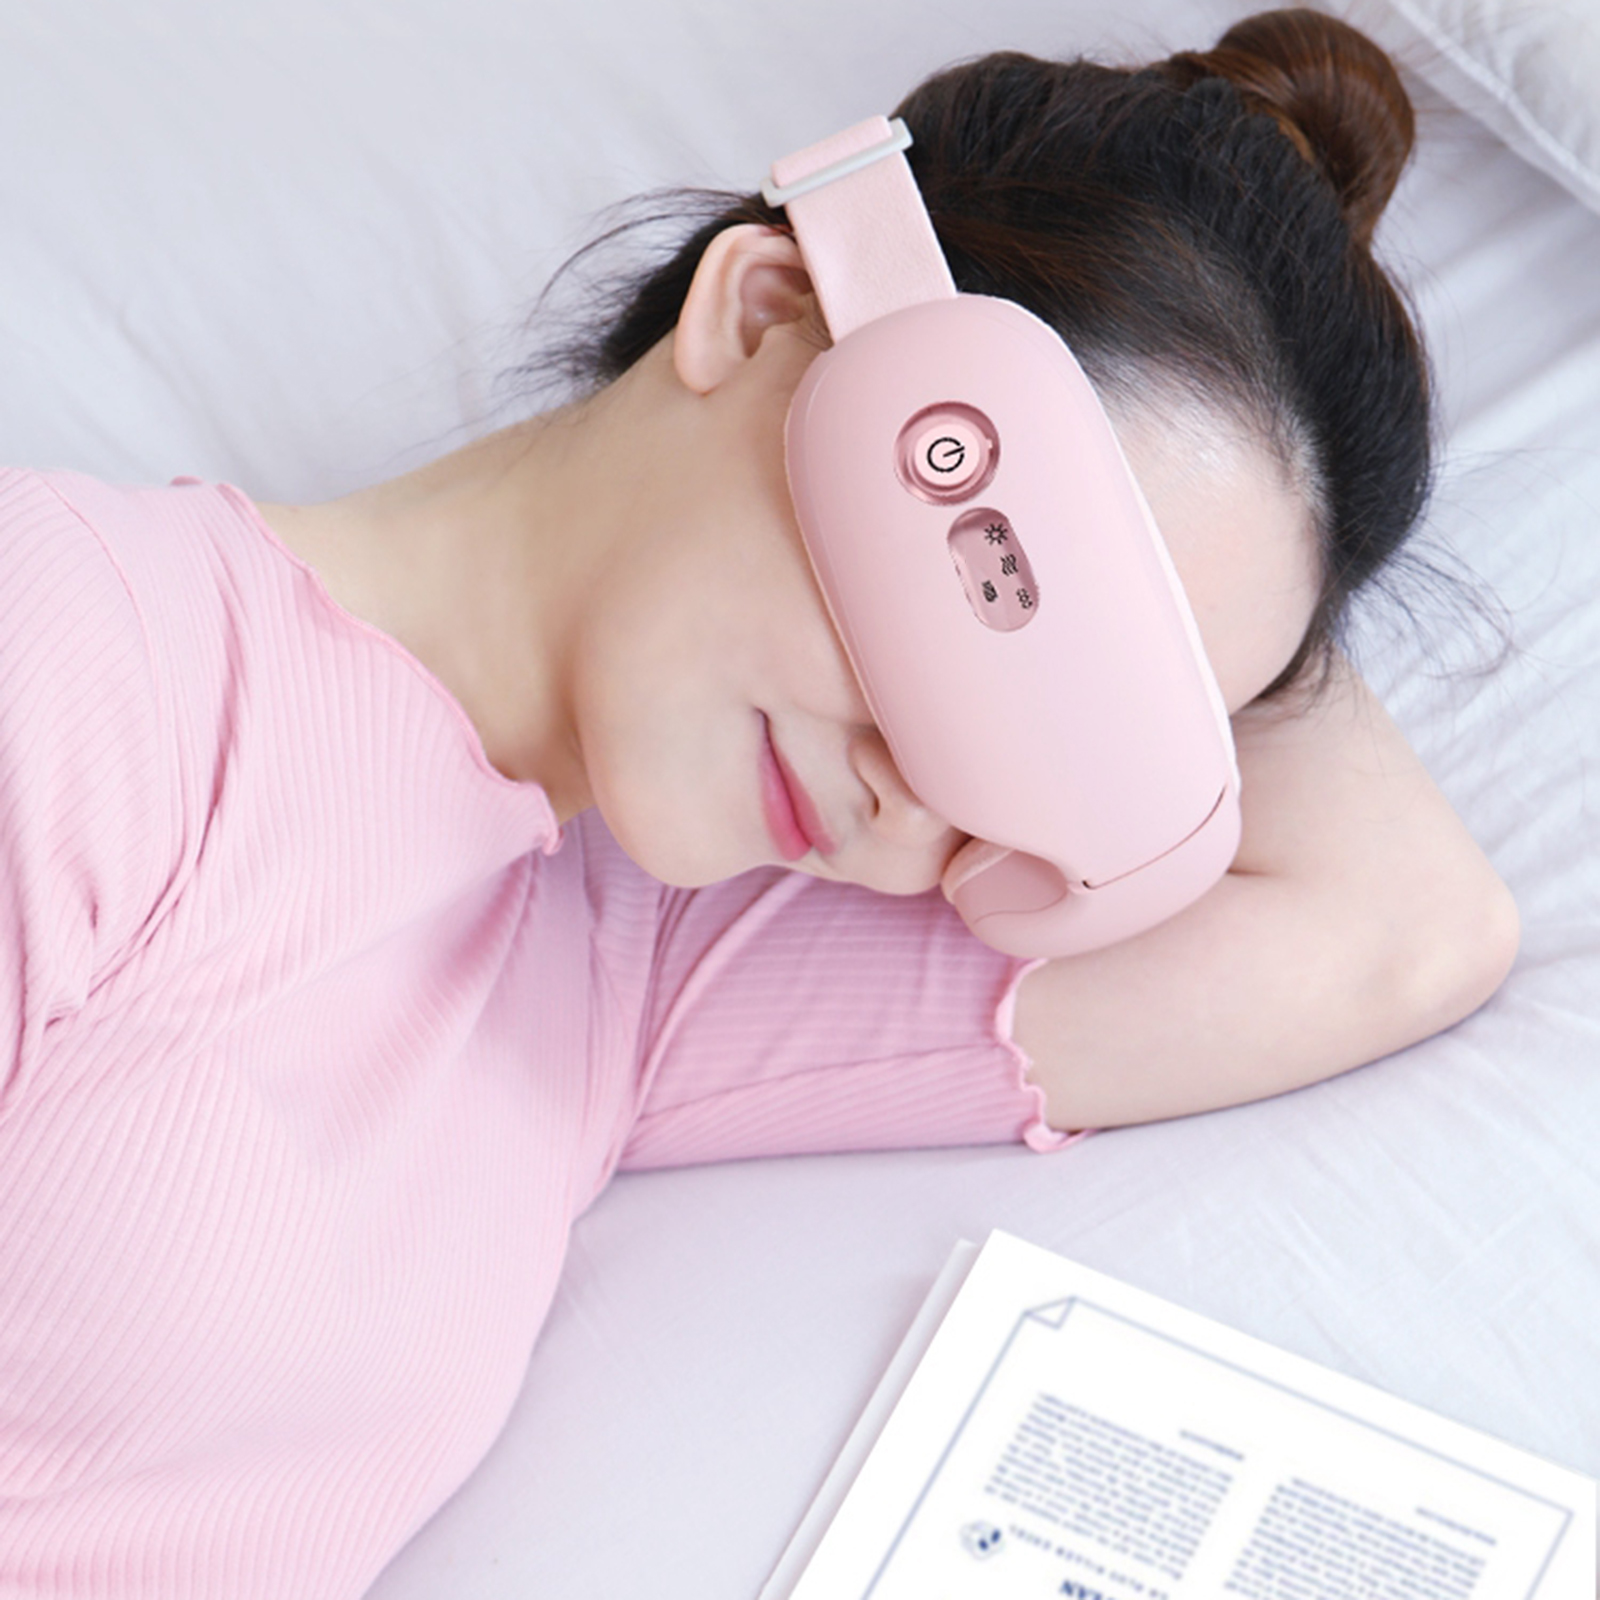 Rechargeable USB Heating Electric Eye Massager Portable Relieving Dry Eyes Heated Eye Mask Sleeping Adjustable Elastic Band